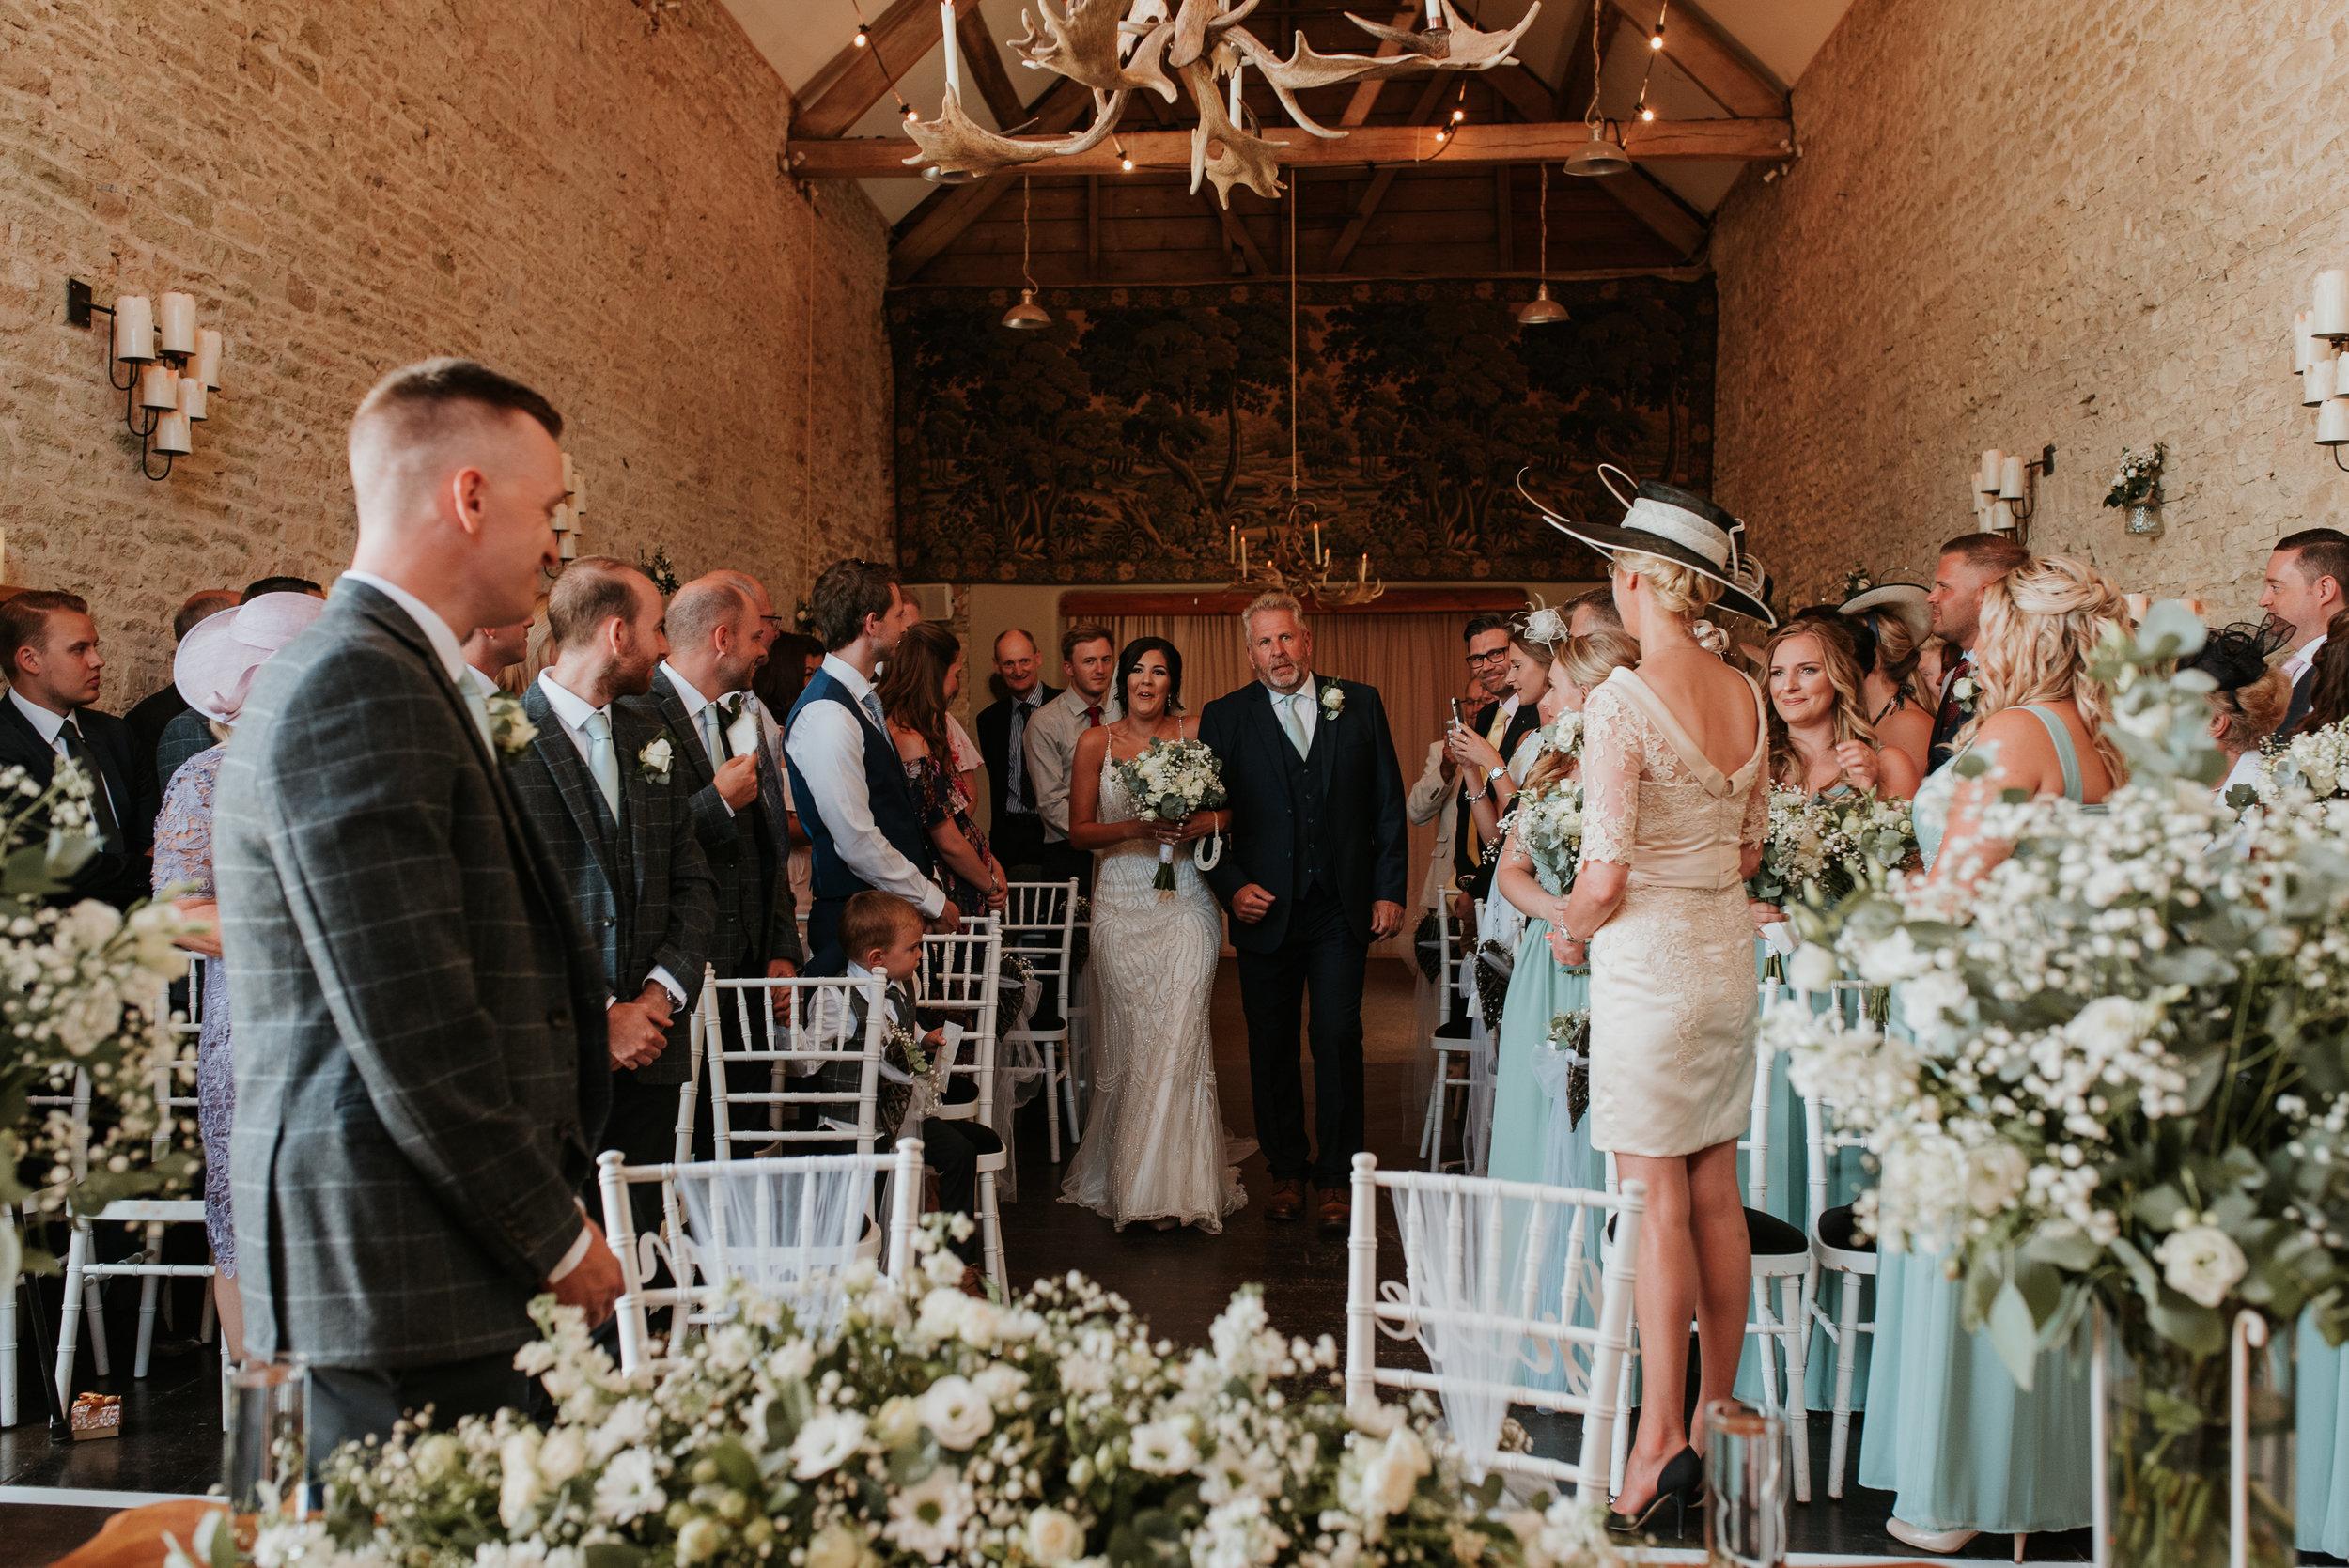 Oxfordshire-wedding-photographer-32.jpg